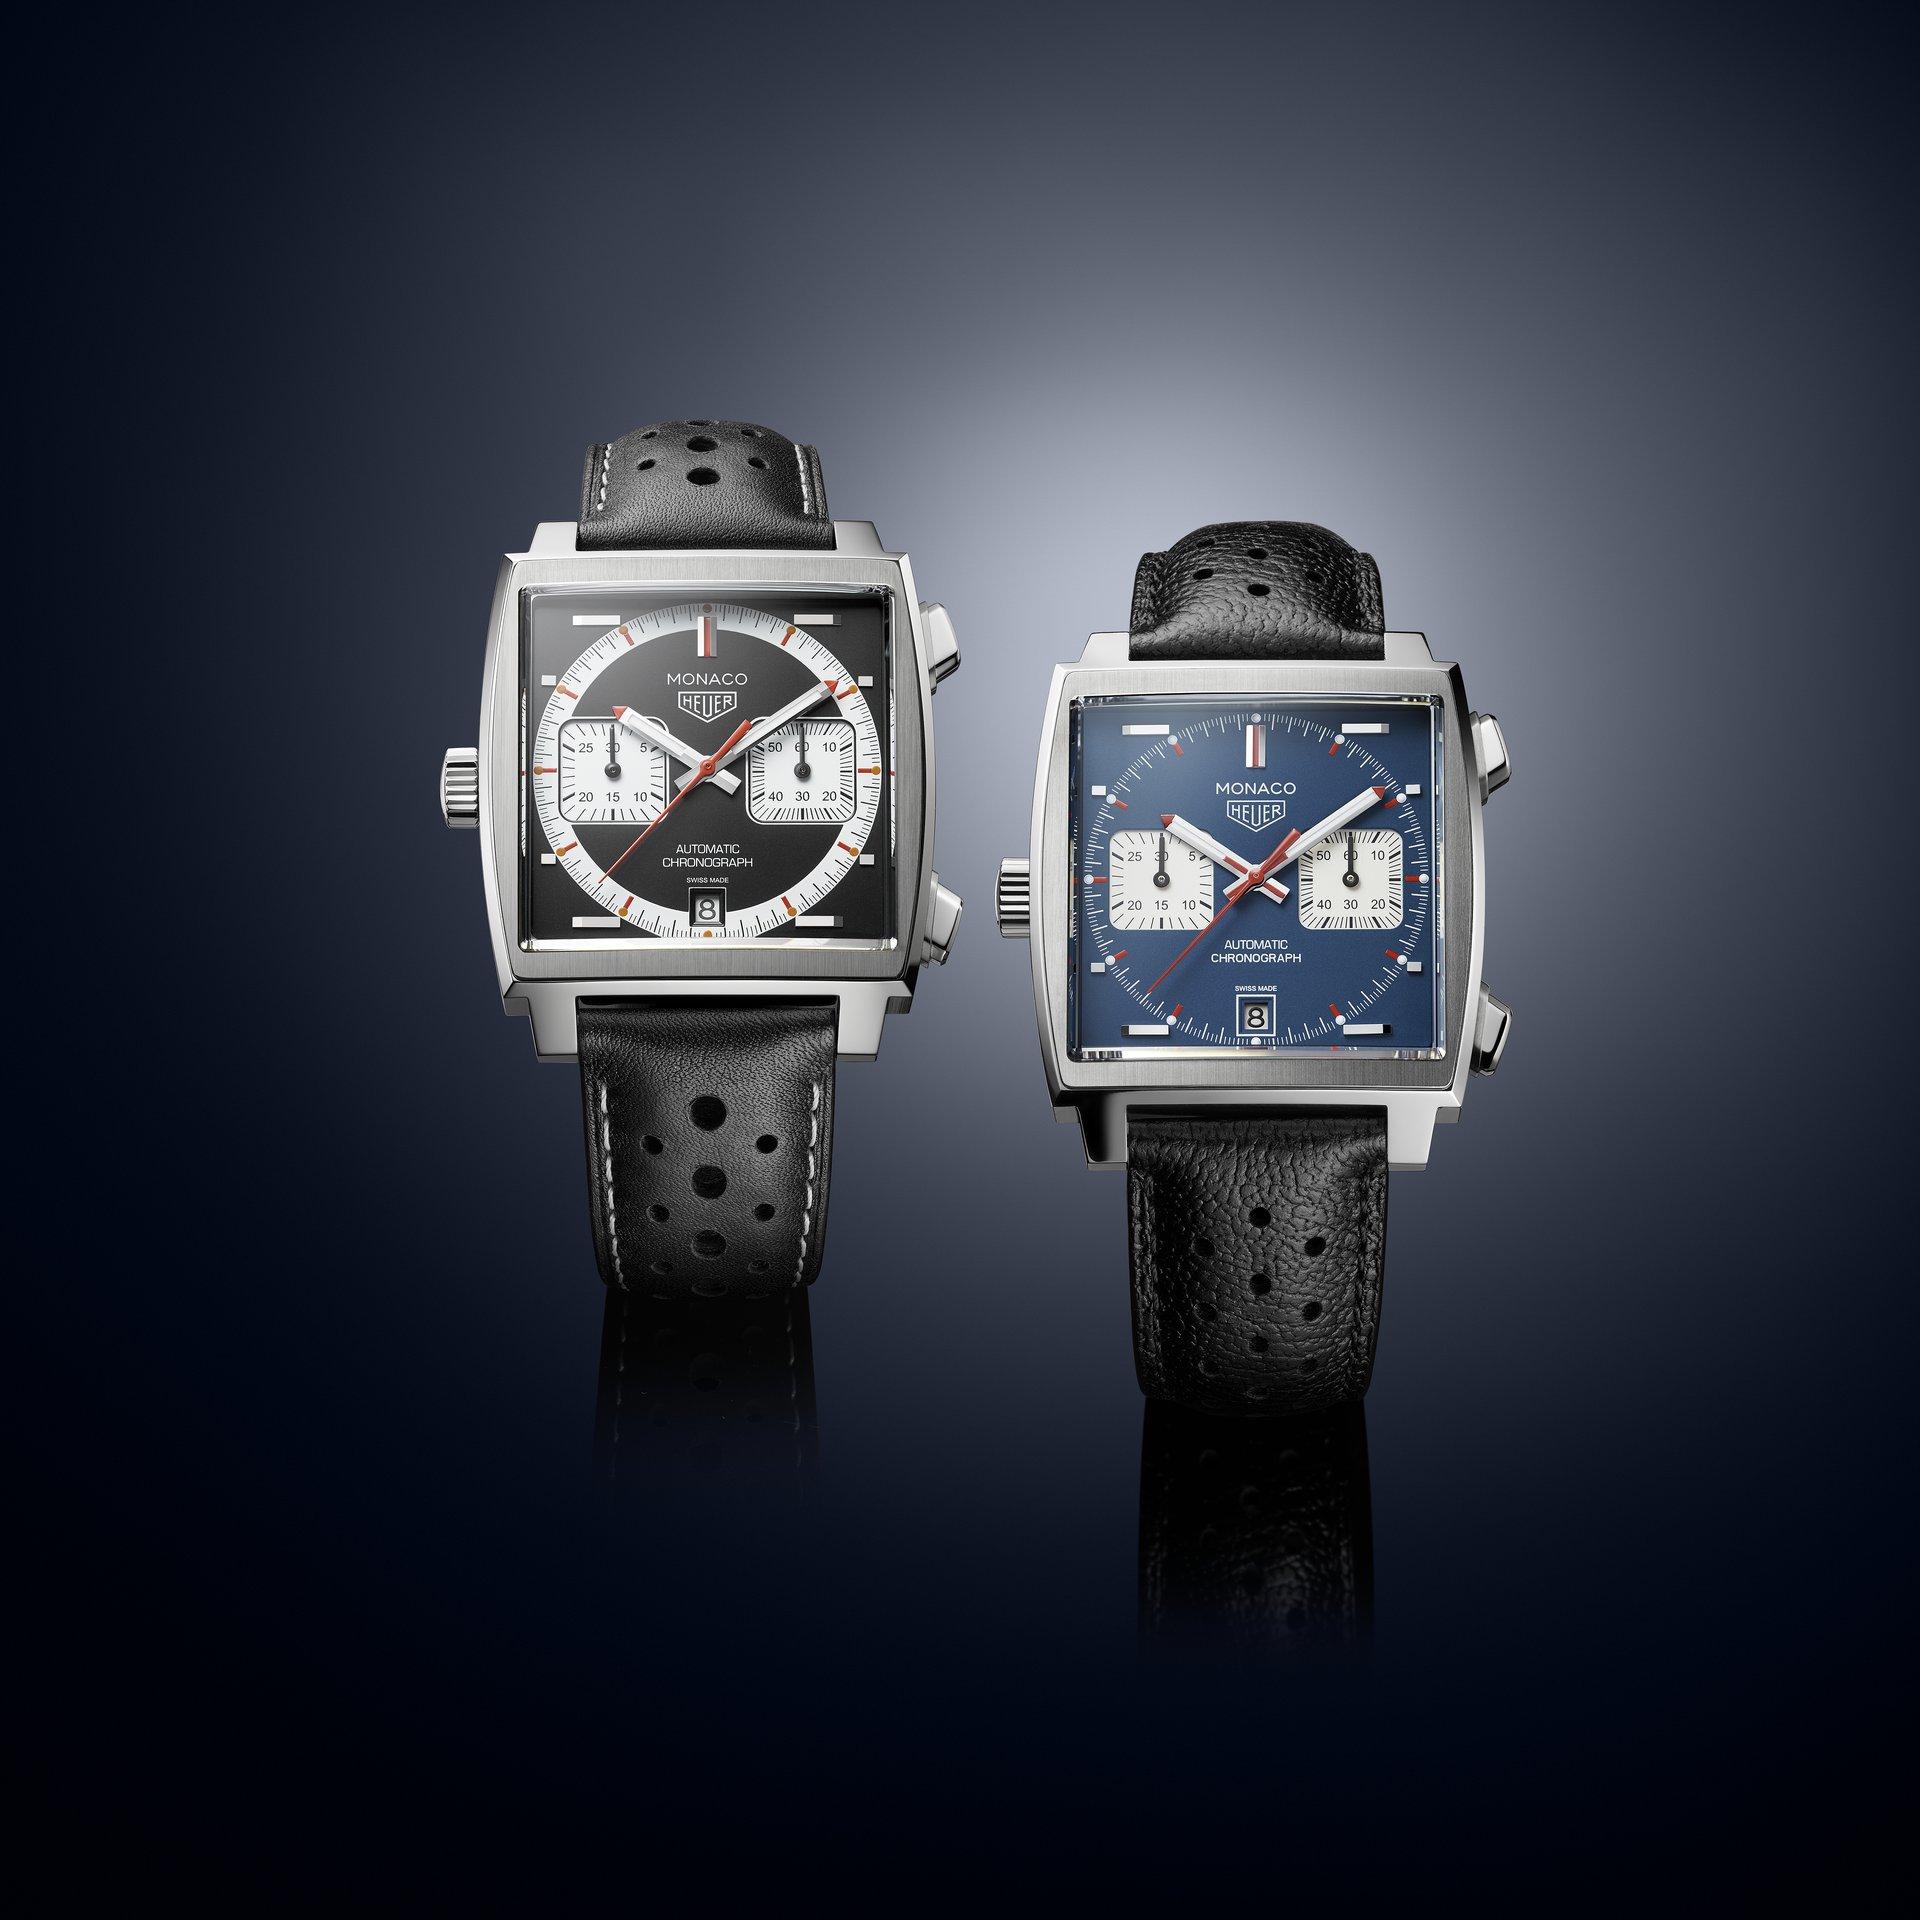 TAG Heuer Monaco Ref. CAW211Y.FC6469 & Ref. CAW211P.FC6356 - Through time 2000's - seduction duo